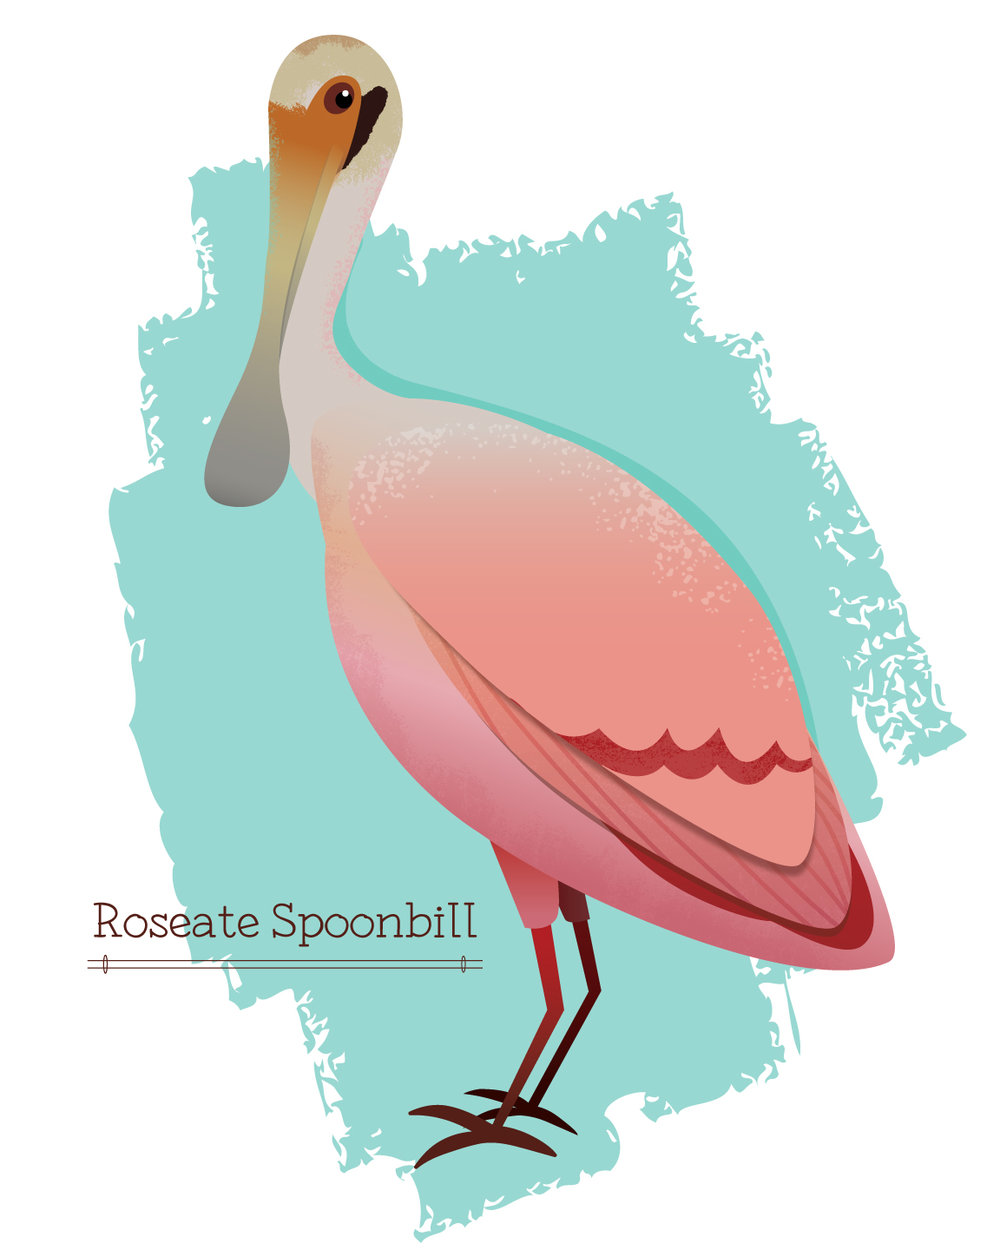 Roseate_Spoonbill.jpg